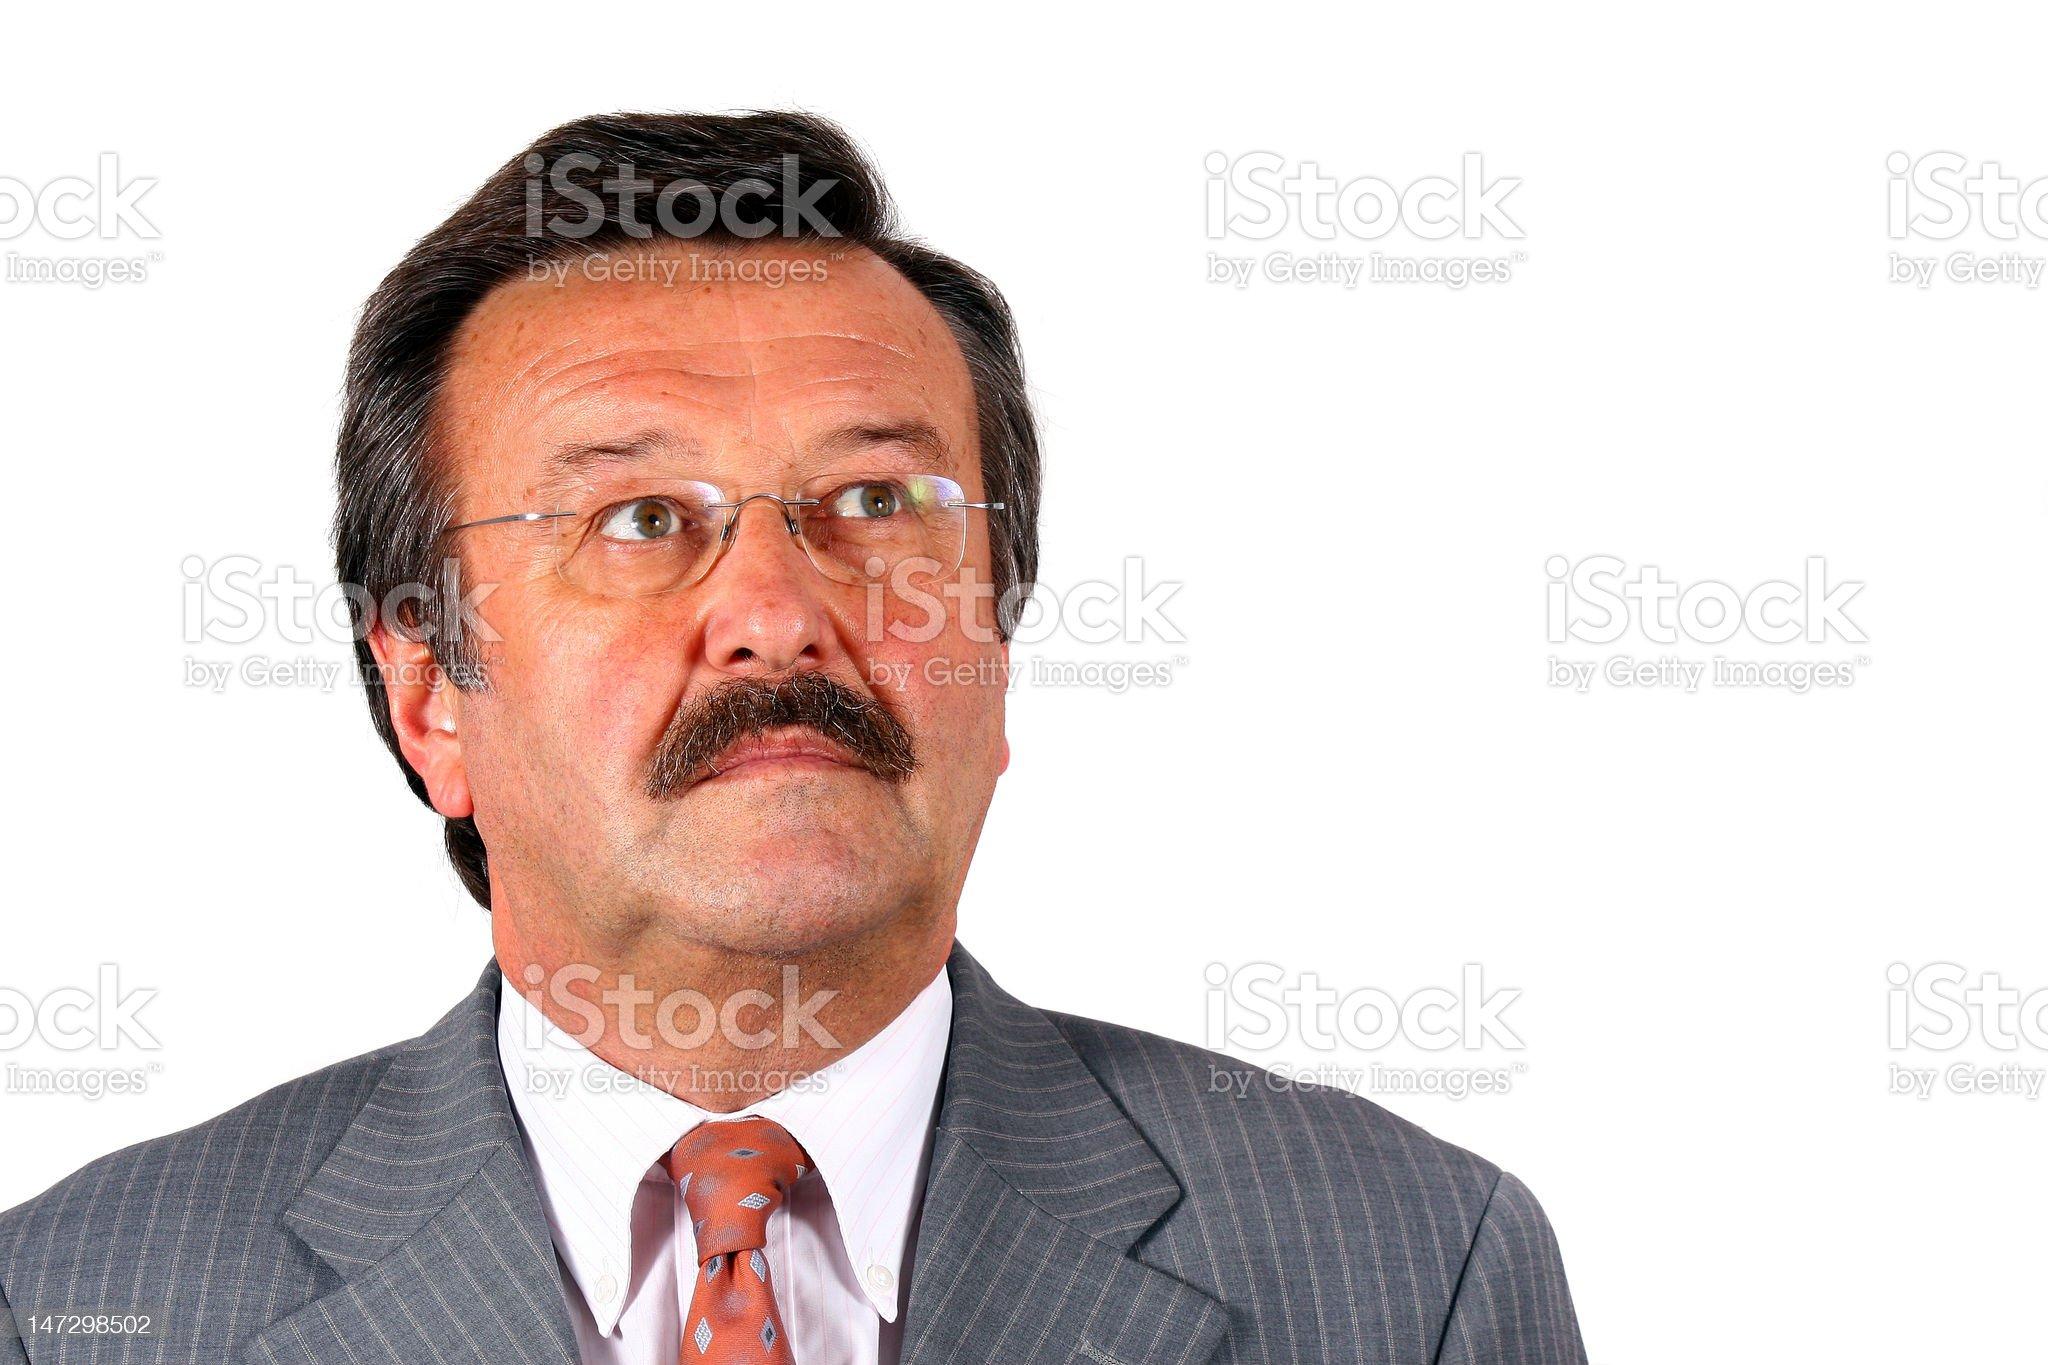 Senior Businessman Looking Up royalty-free stock photo